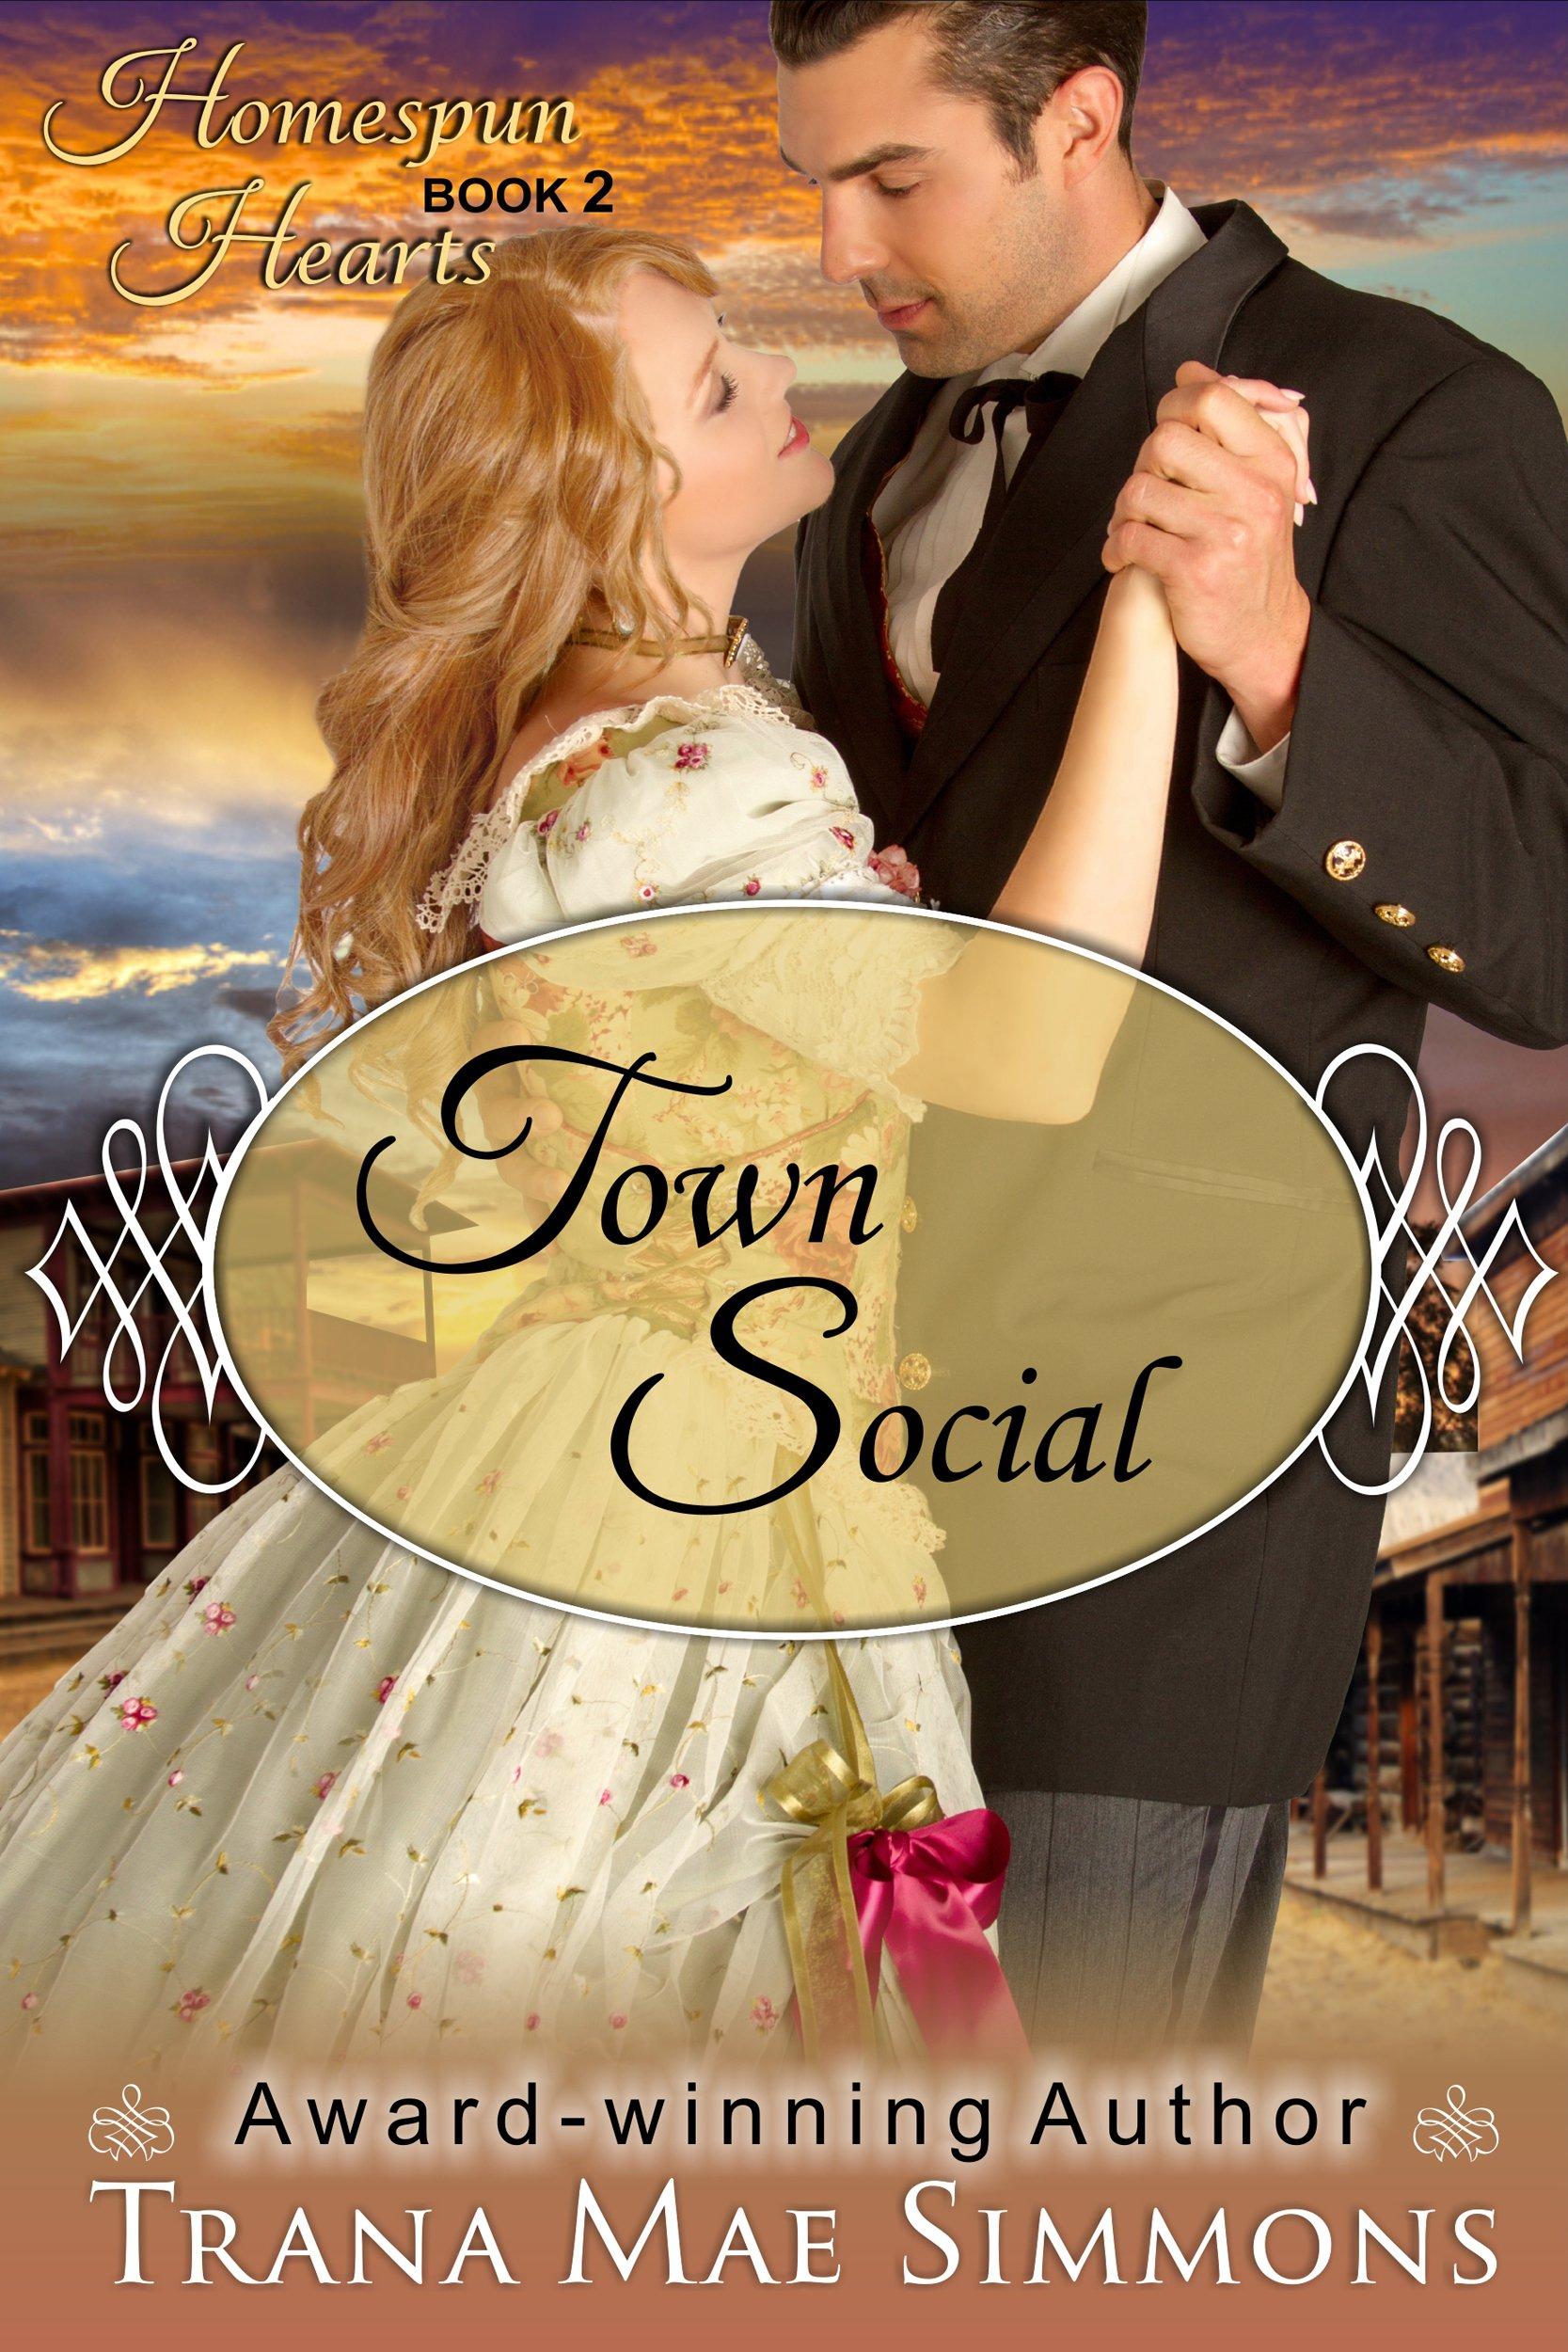 Town Social (The Homespun Hearts Series, Book 2): Trana Mae Simmons:  9781614175964: Amazon.com: Books